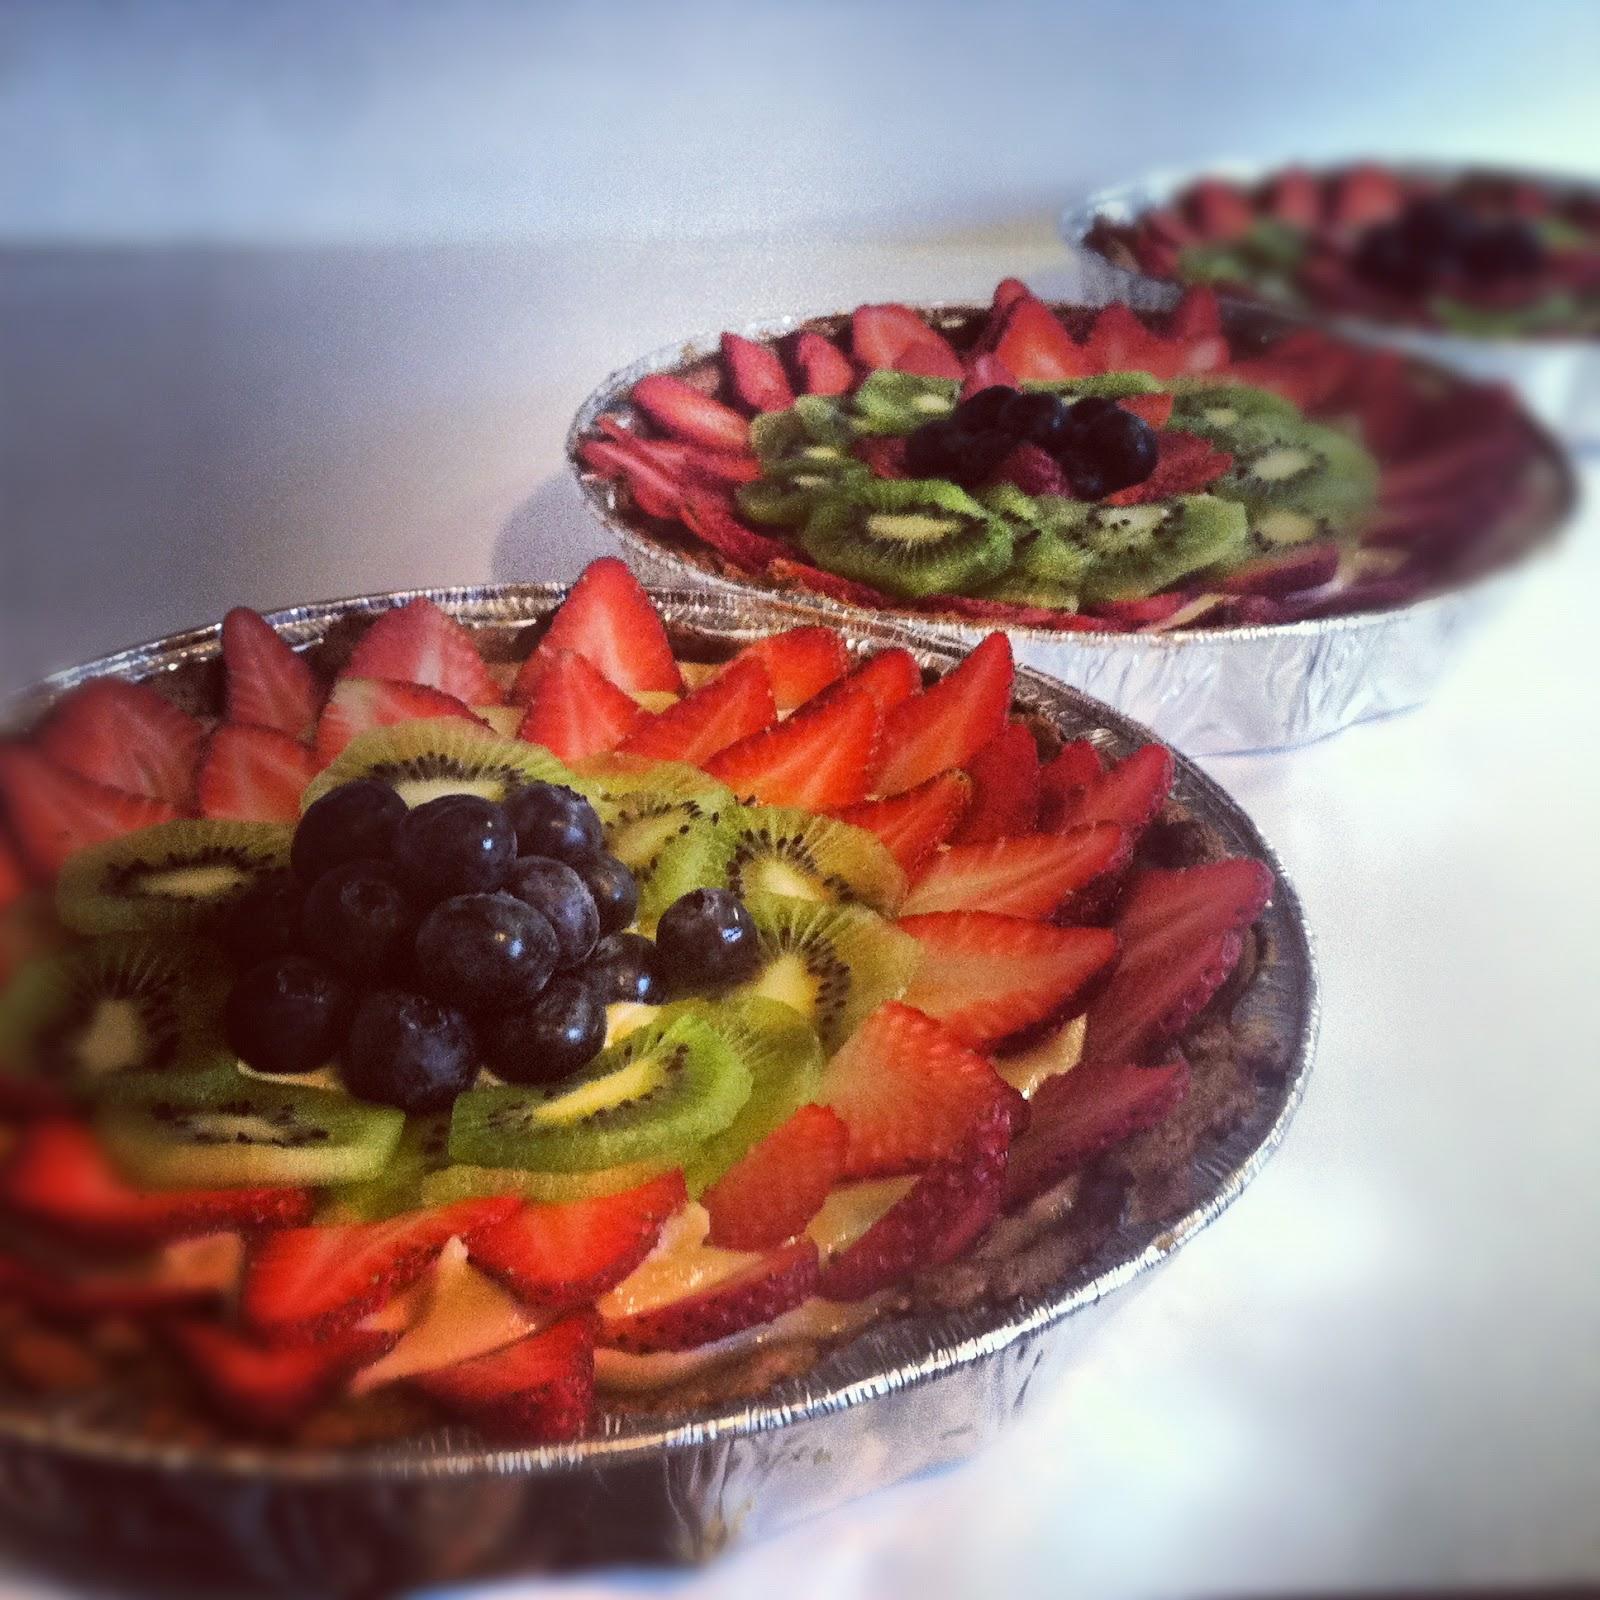 farshicle tarte aux fruit a healthier fruit tart. Black Bedroom Furniture Sets. Home Design Ideas